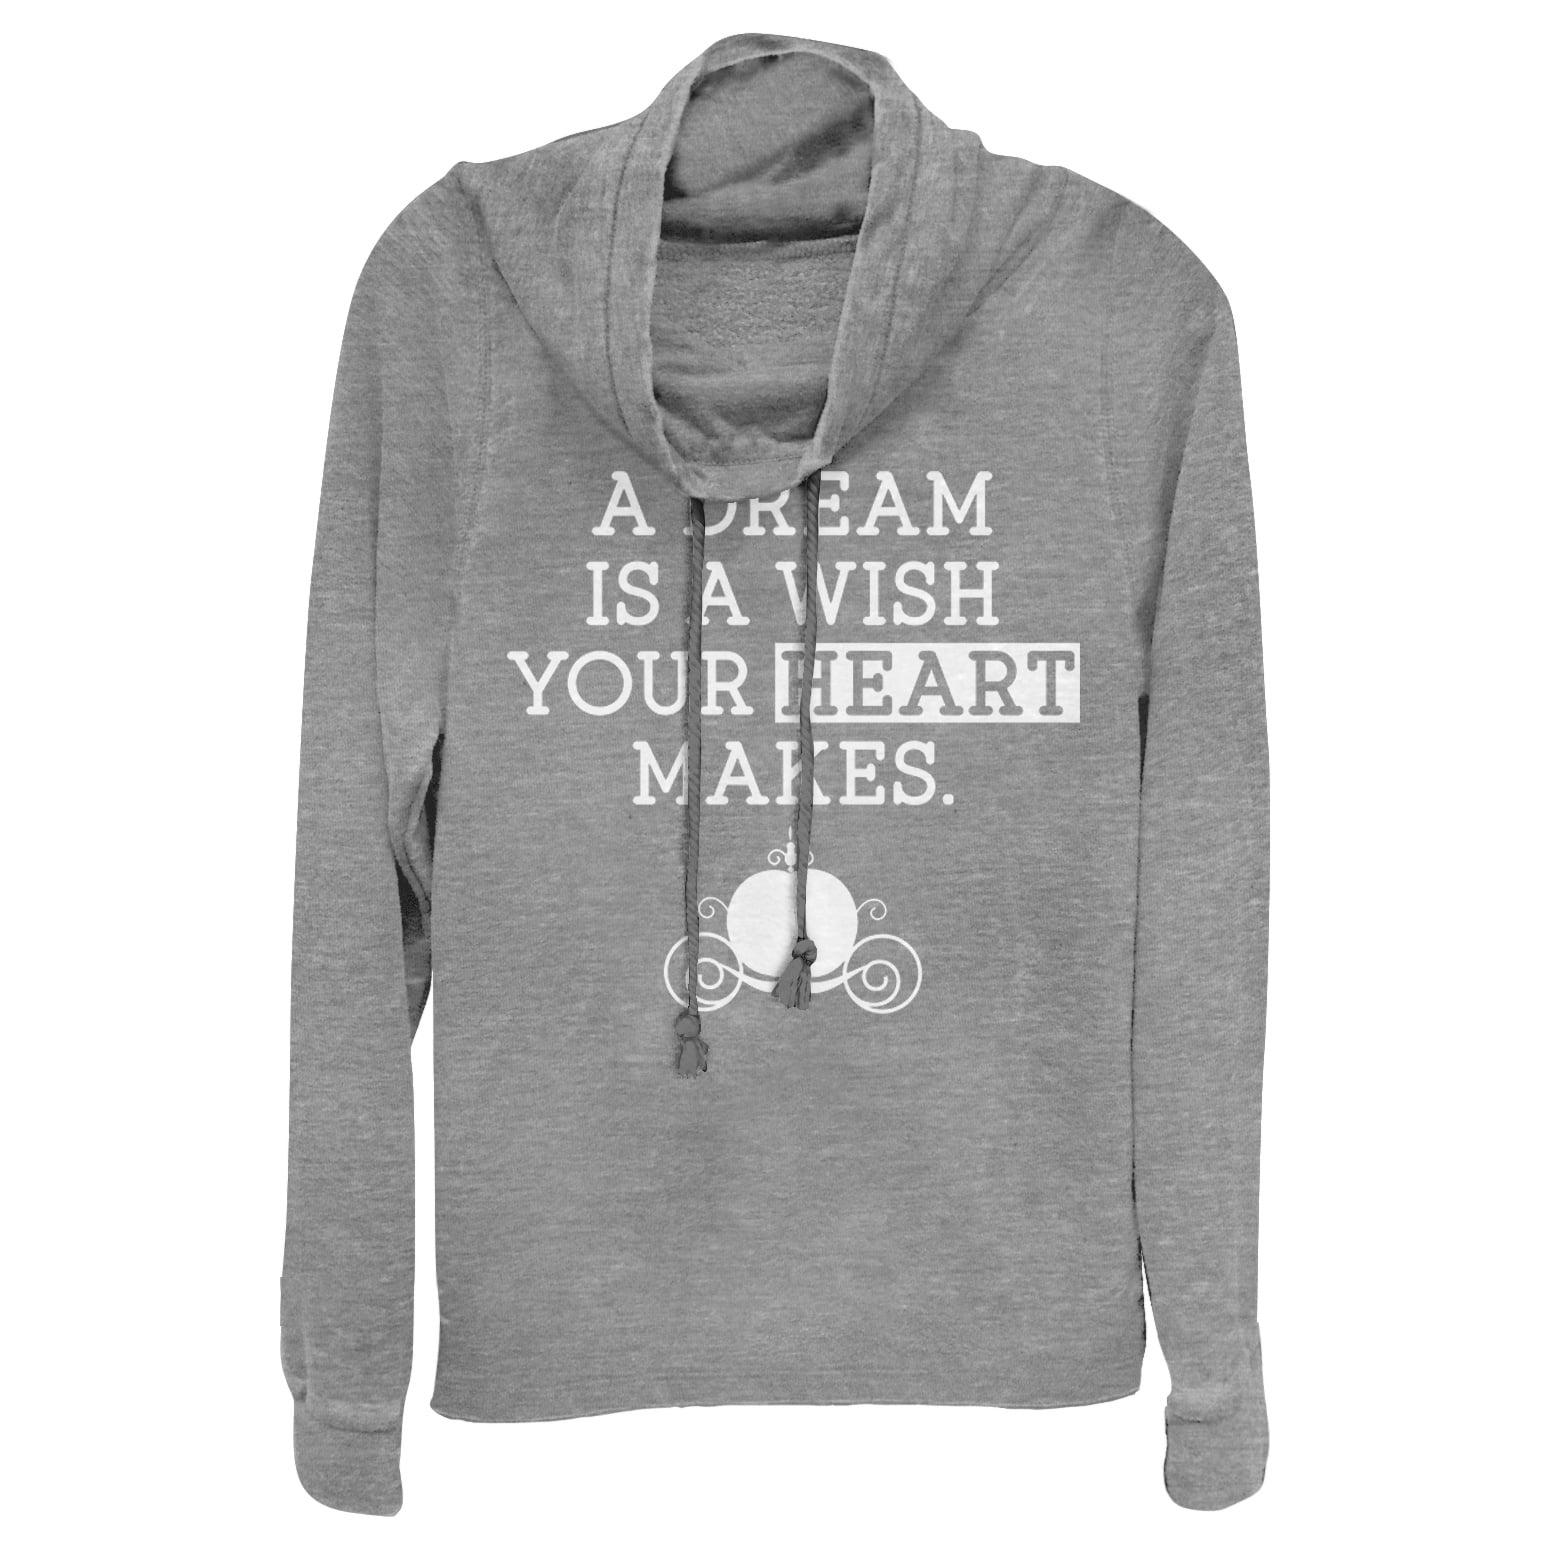 Cinderella Juniors' A Dream Is a Wish Your Heart Makes Cowl Neck Sweatshirt